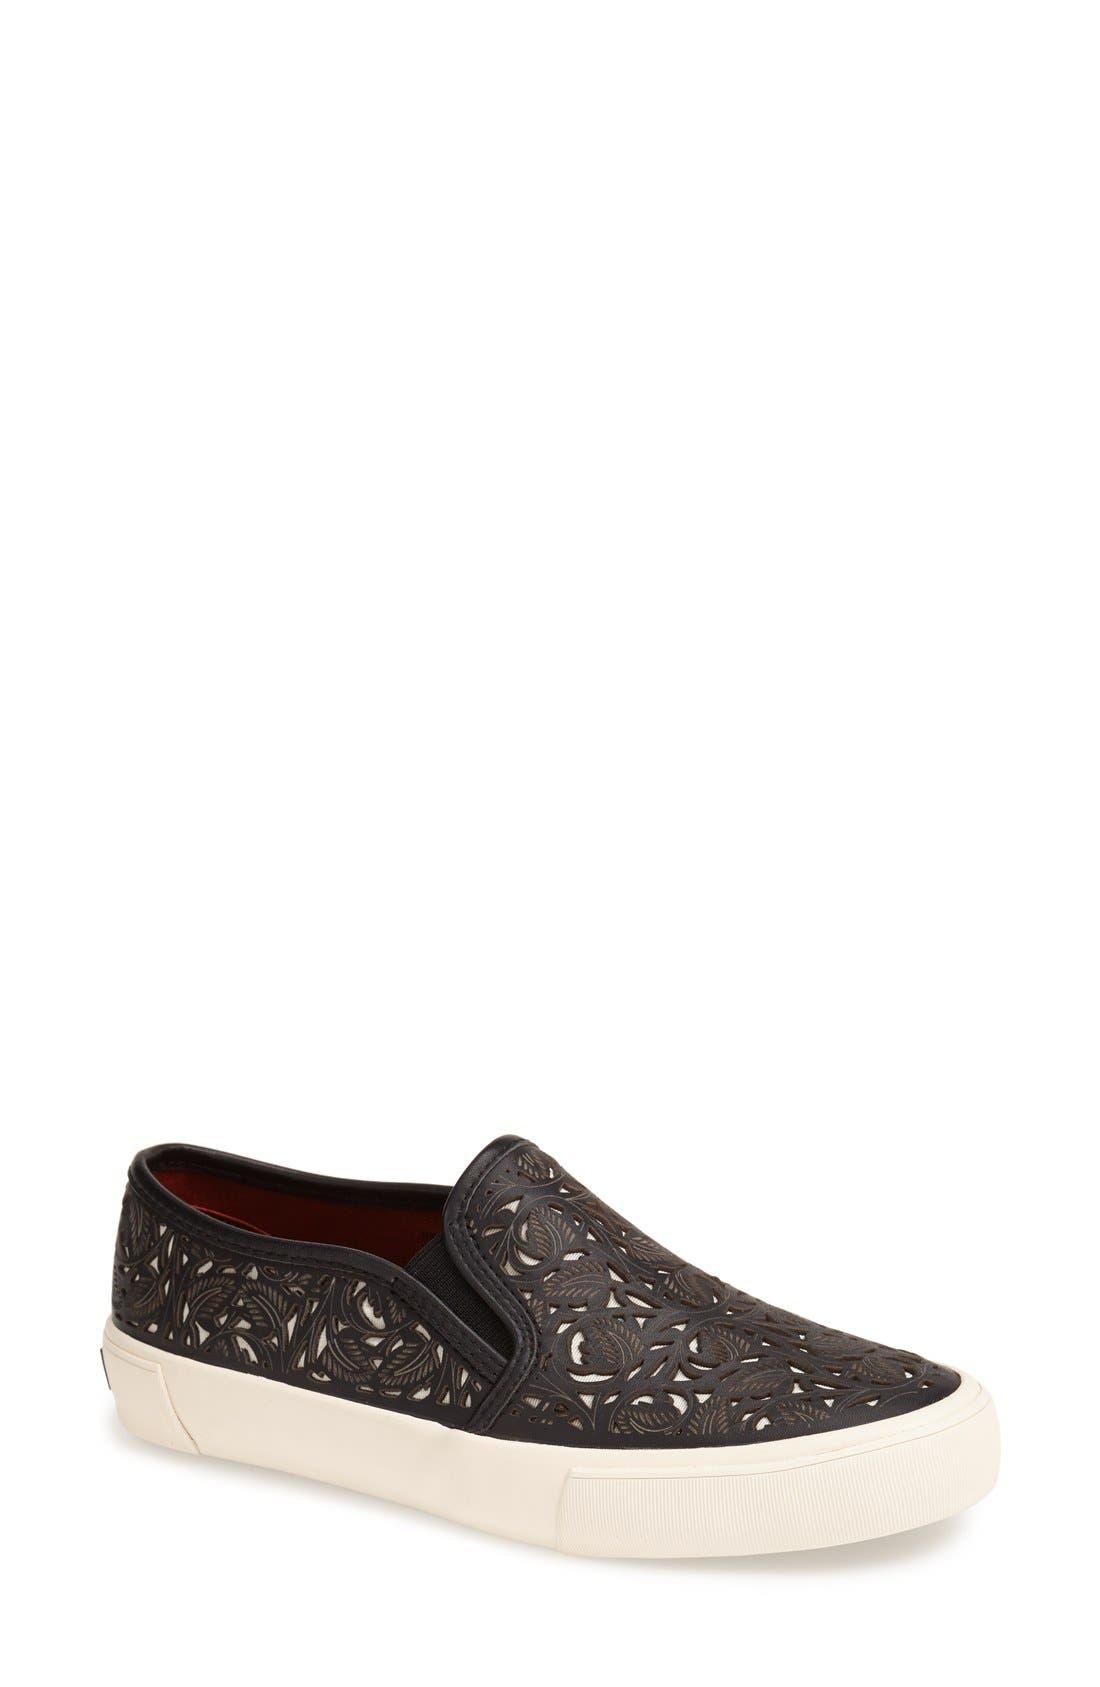 AERIN,                             'Marsden' Perforated Slip-On Sneaker,                             Main thumbnail 1, color,                             001